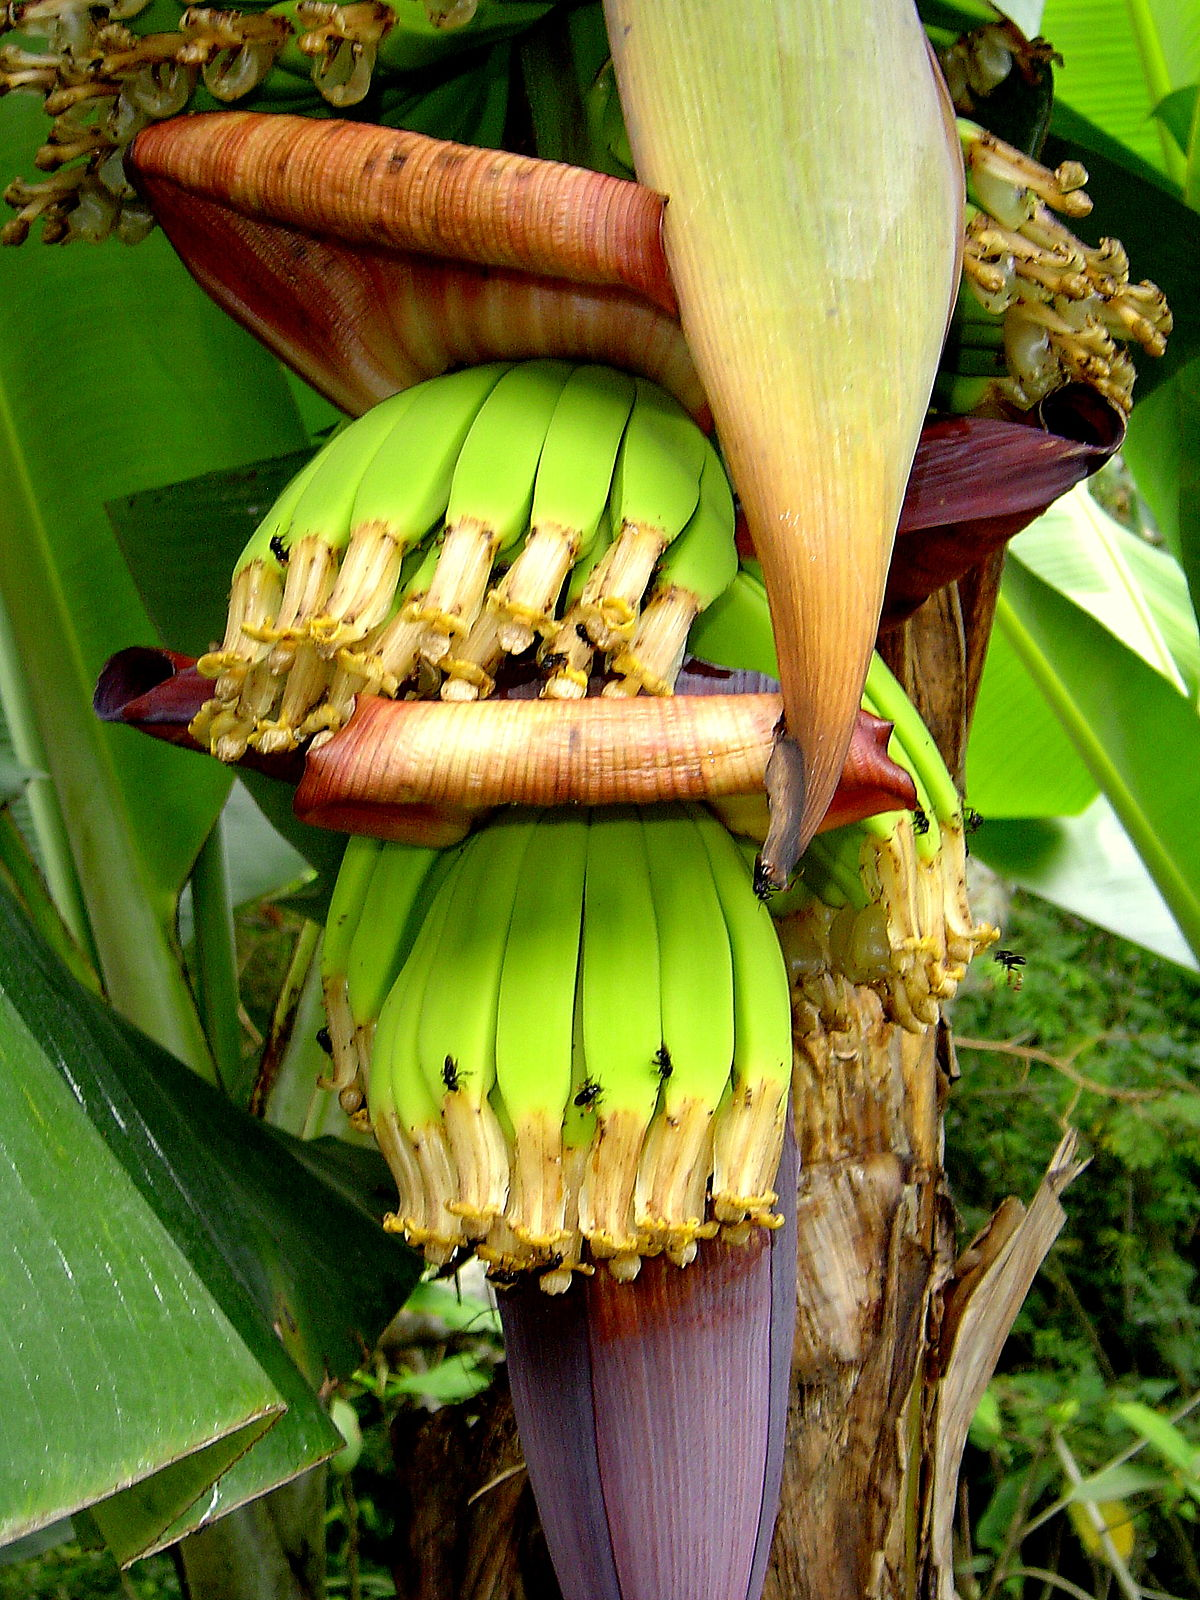 Banana production in Brazil - Wikipedia